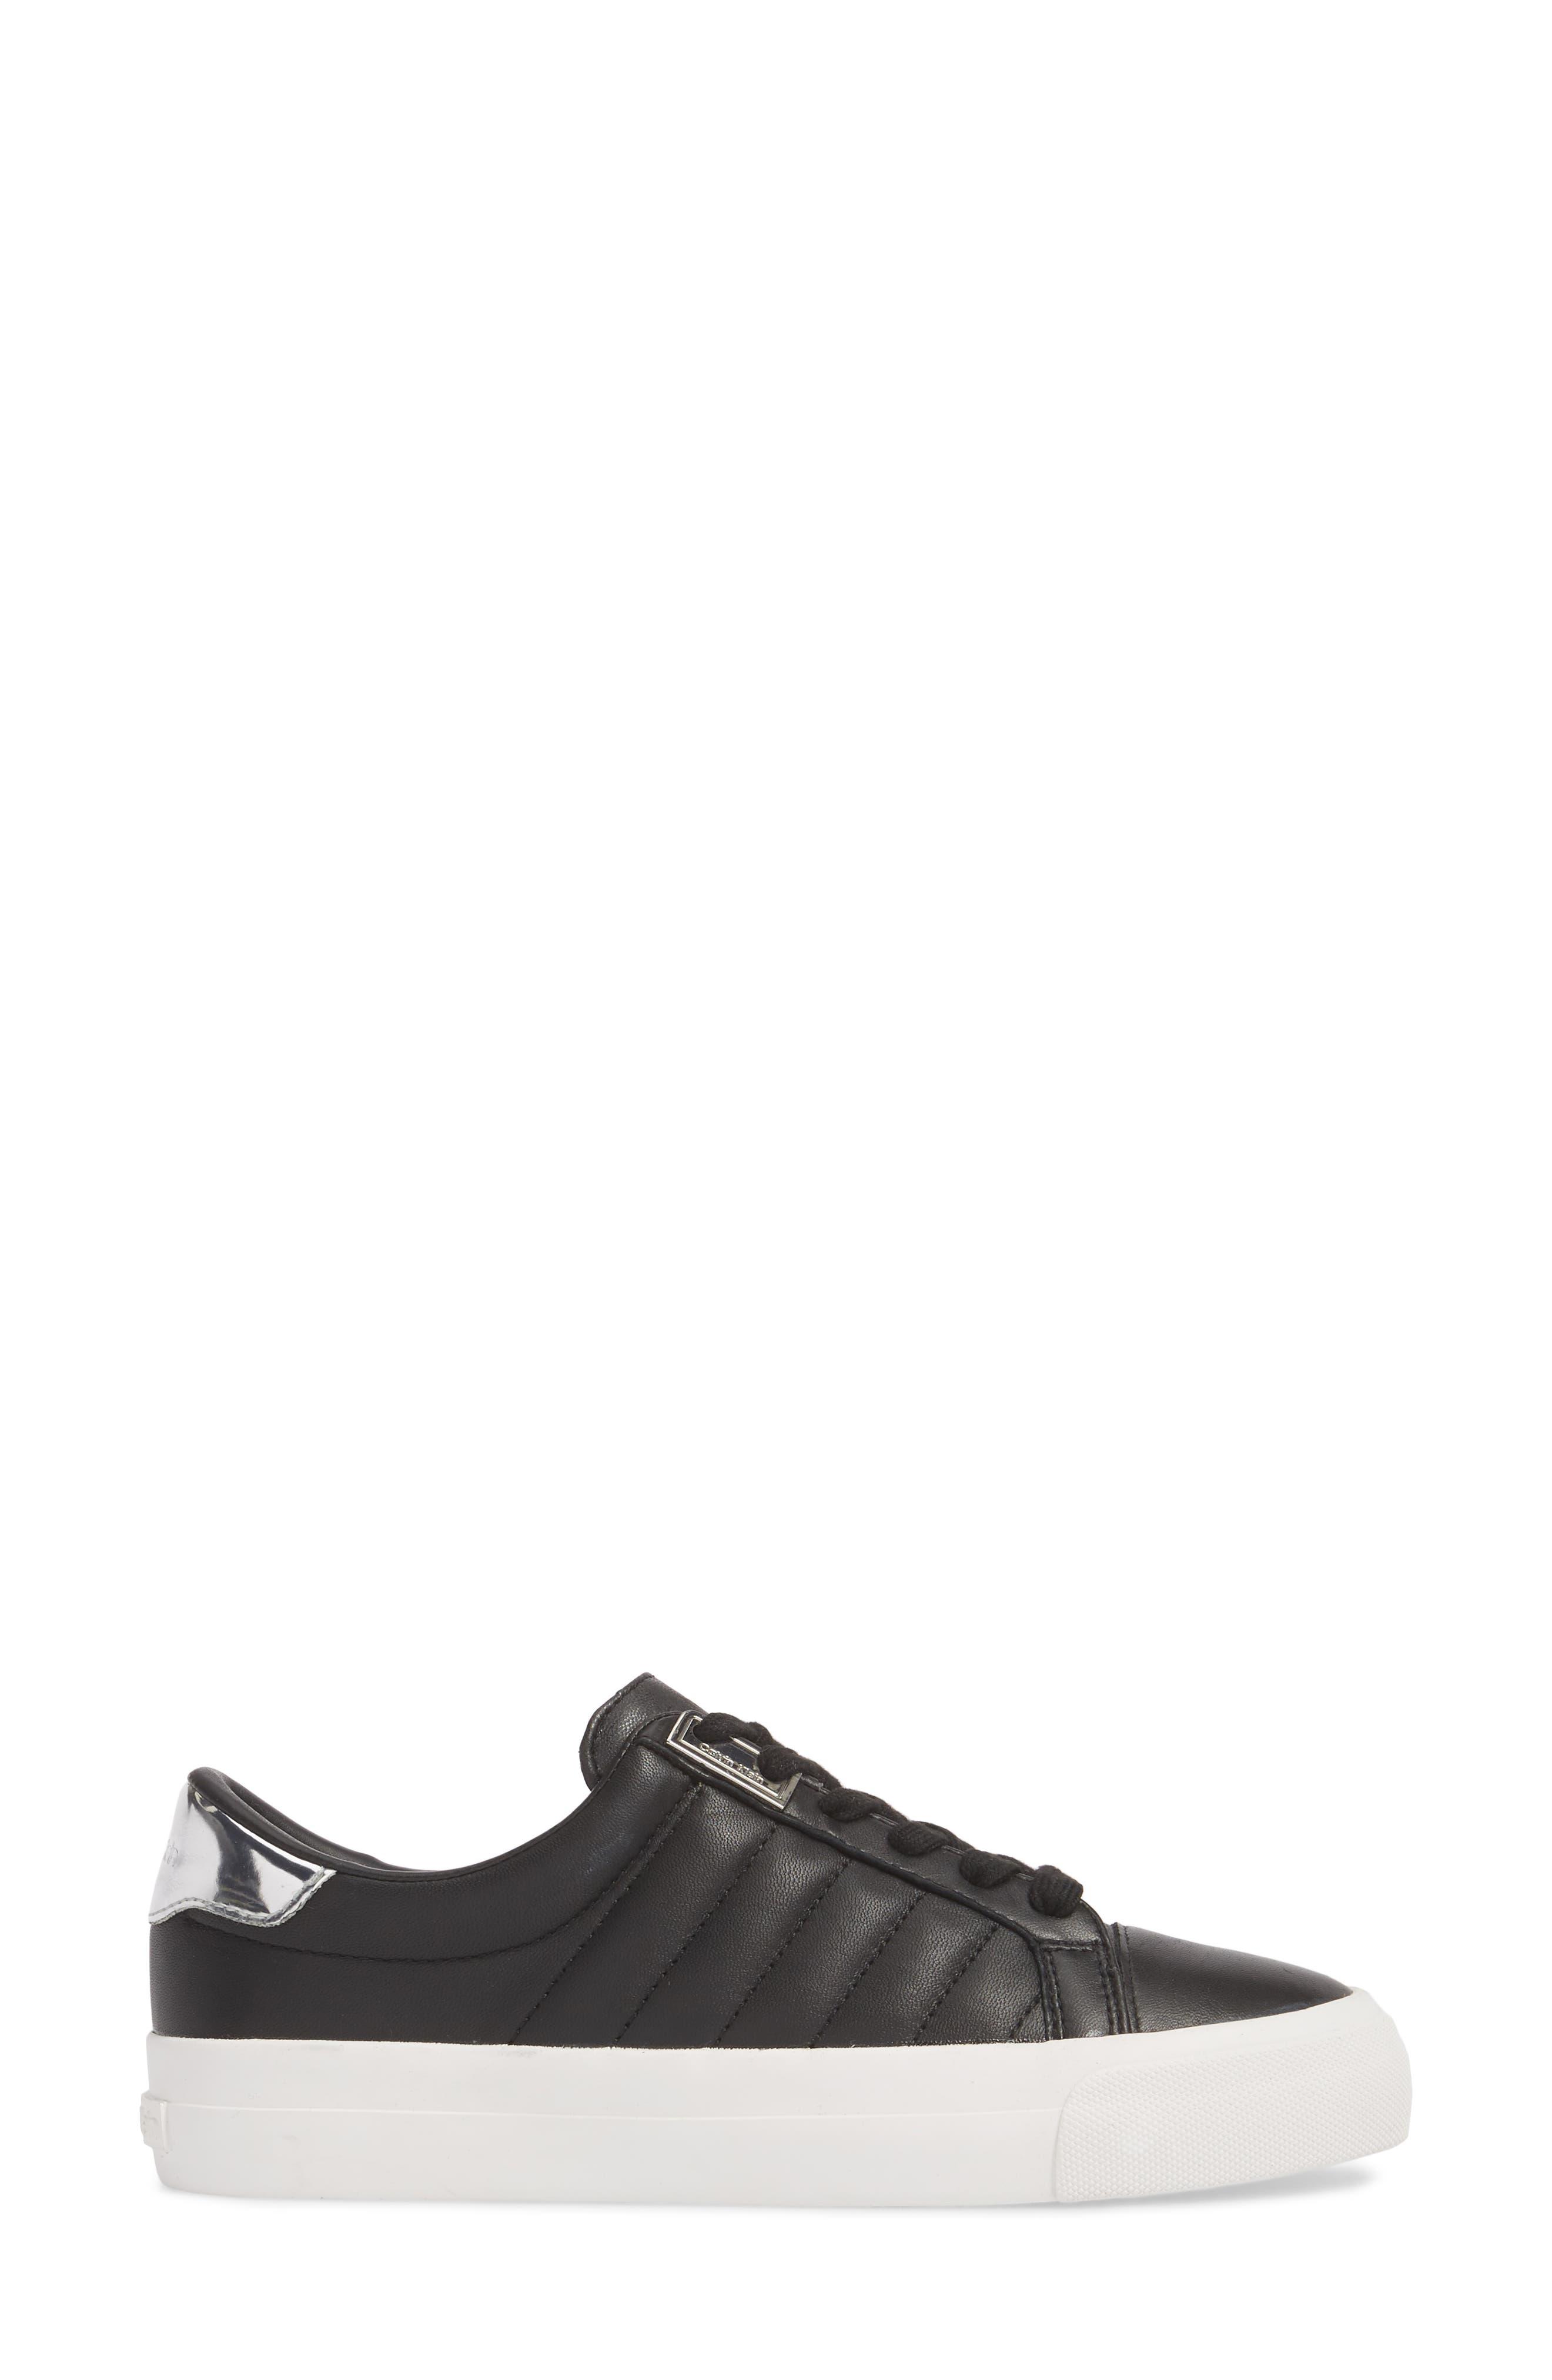 Vance Sneaker,                             Alternate thumbnail 3, color,                             Black Leather